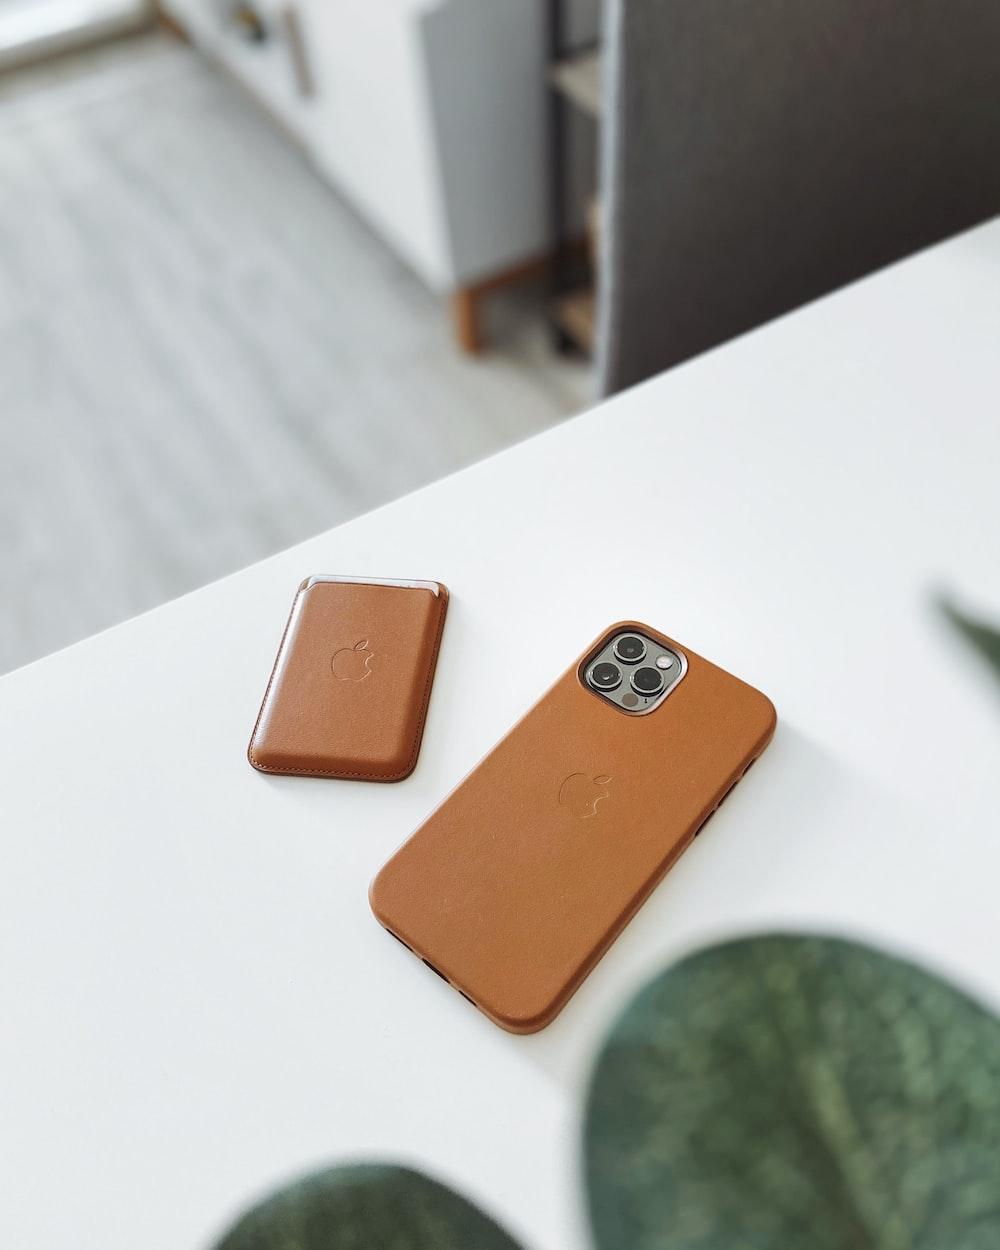 orange iphone case on white table